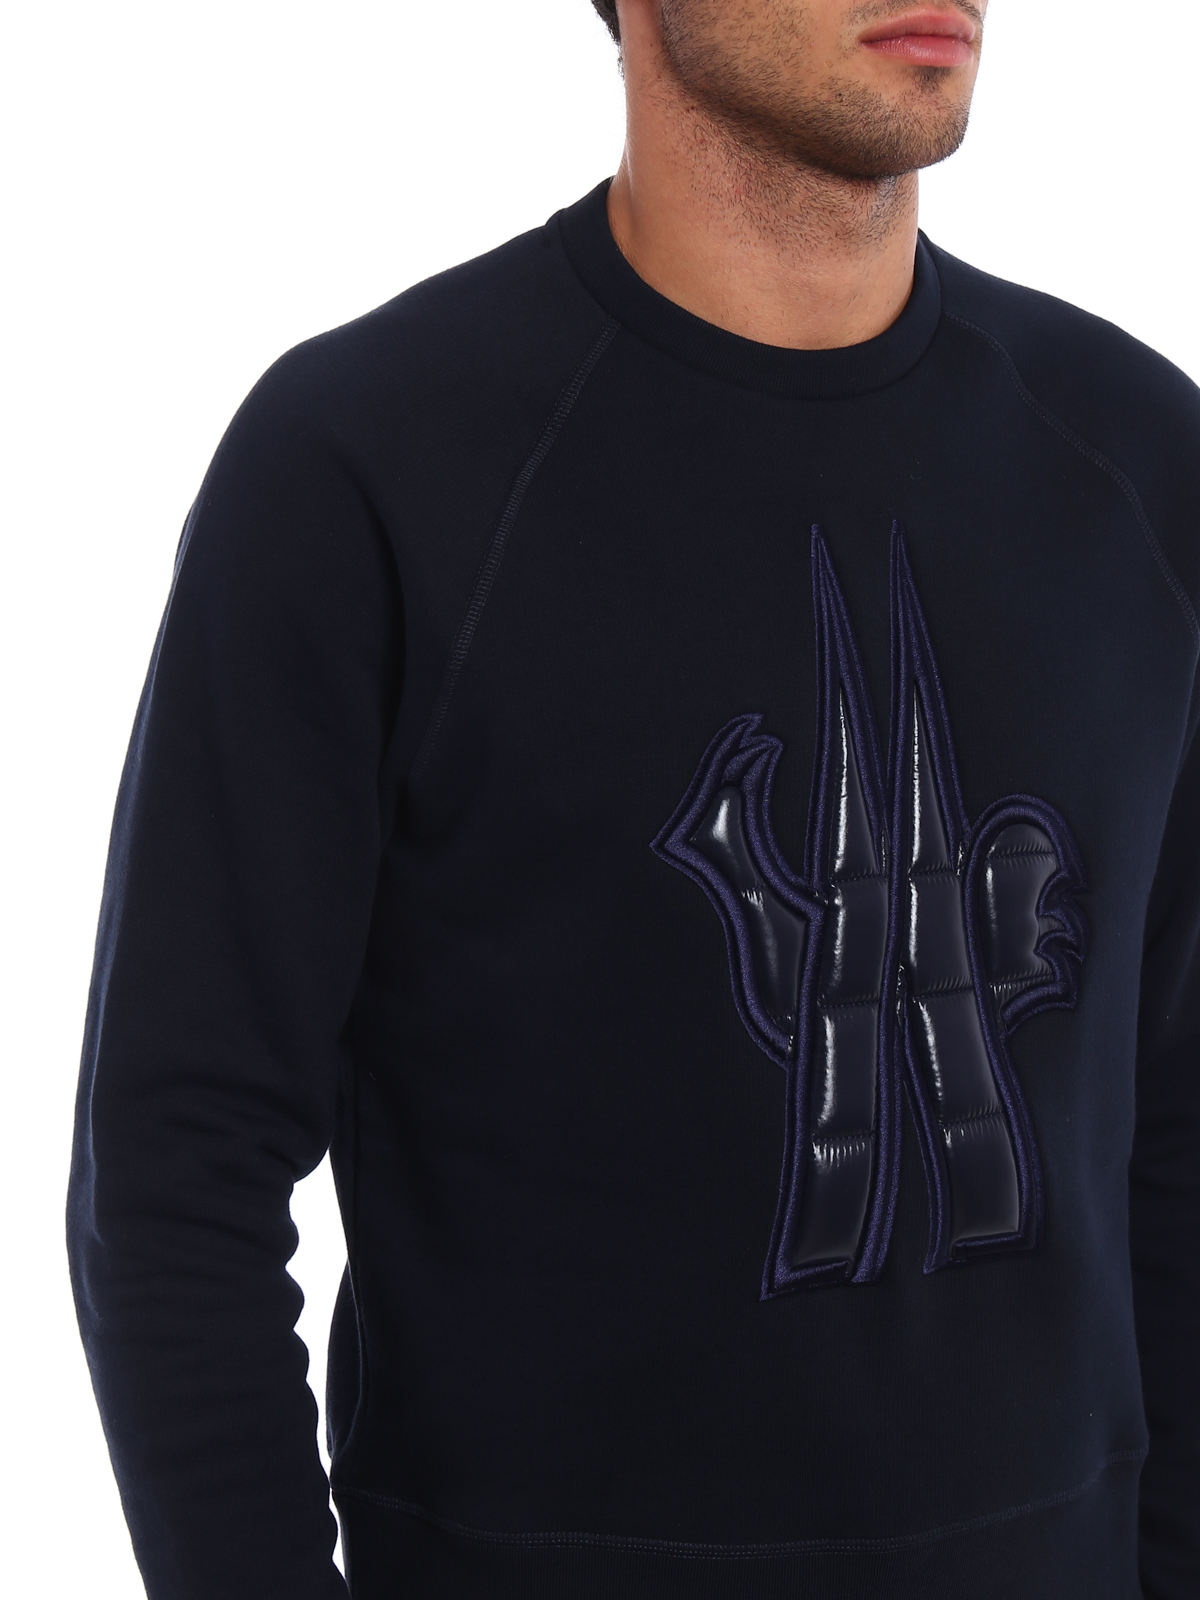 4f0a529cef3c Moncler Grenoble - Quilted nylon logo sweatshirt - Sweatshirts ...